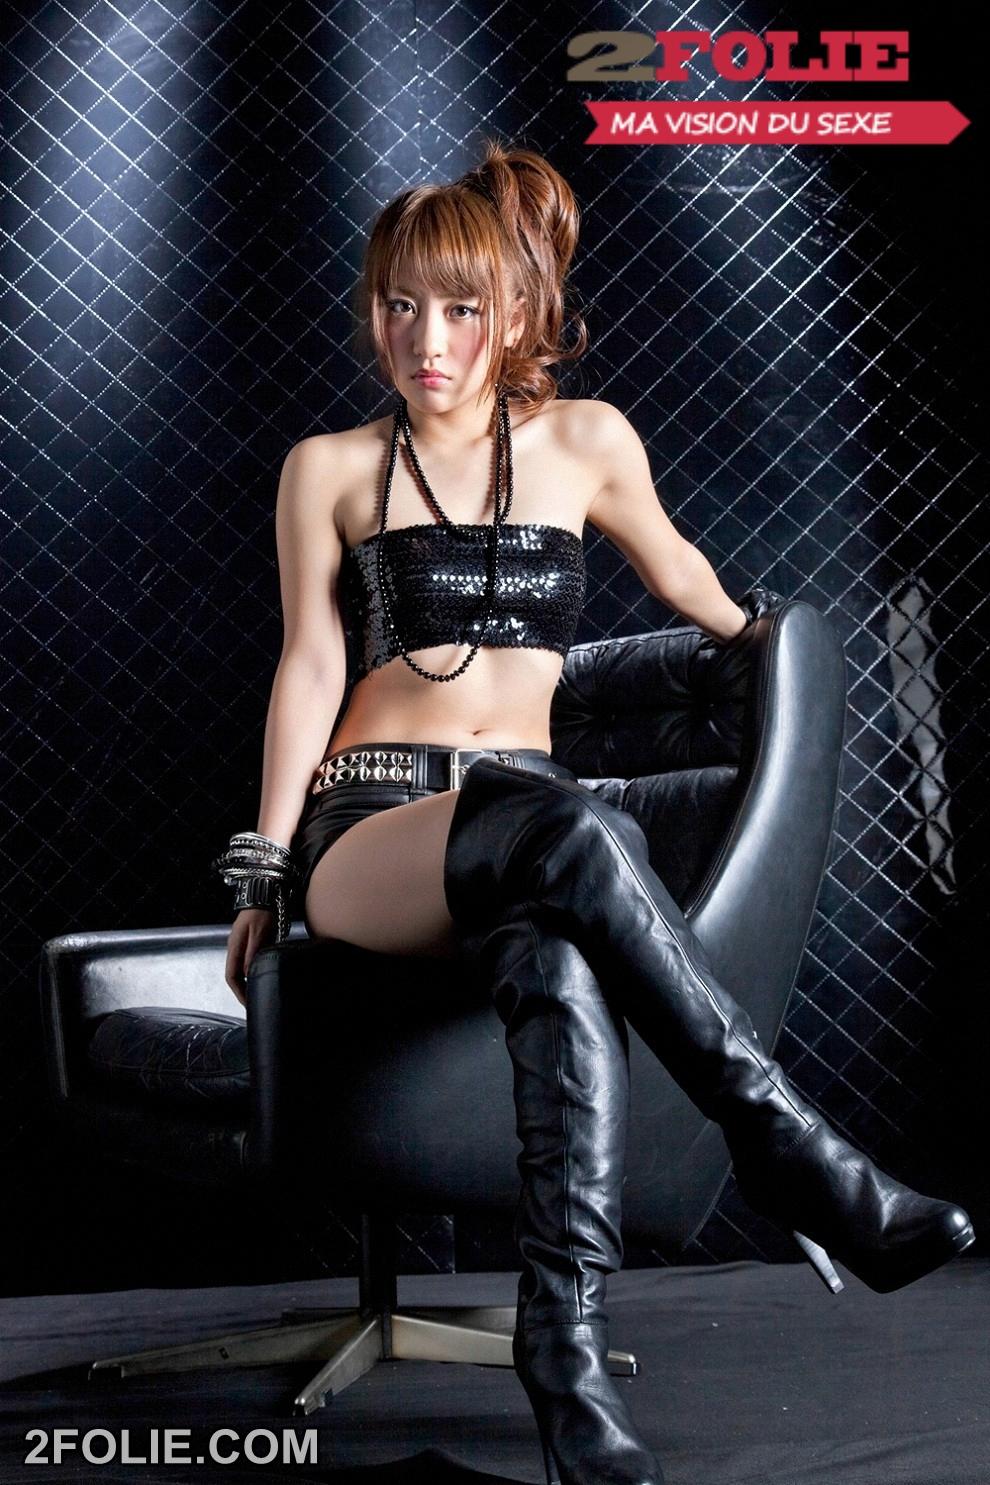 filles sexy en cuir images de sexe